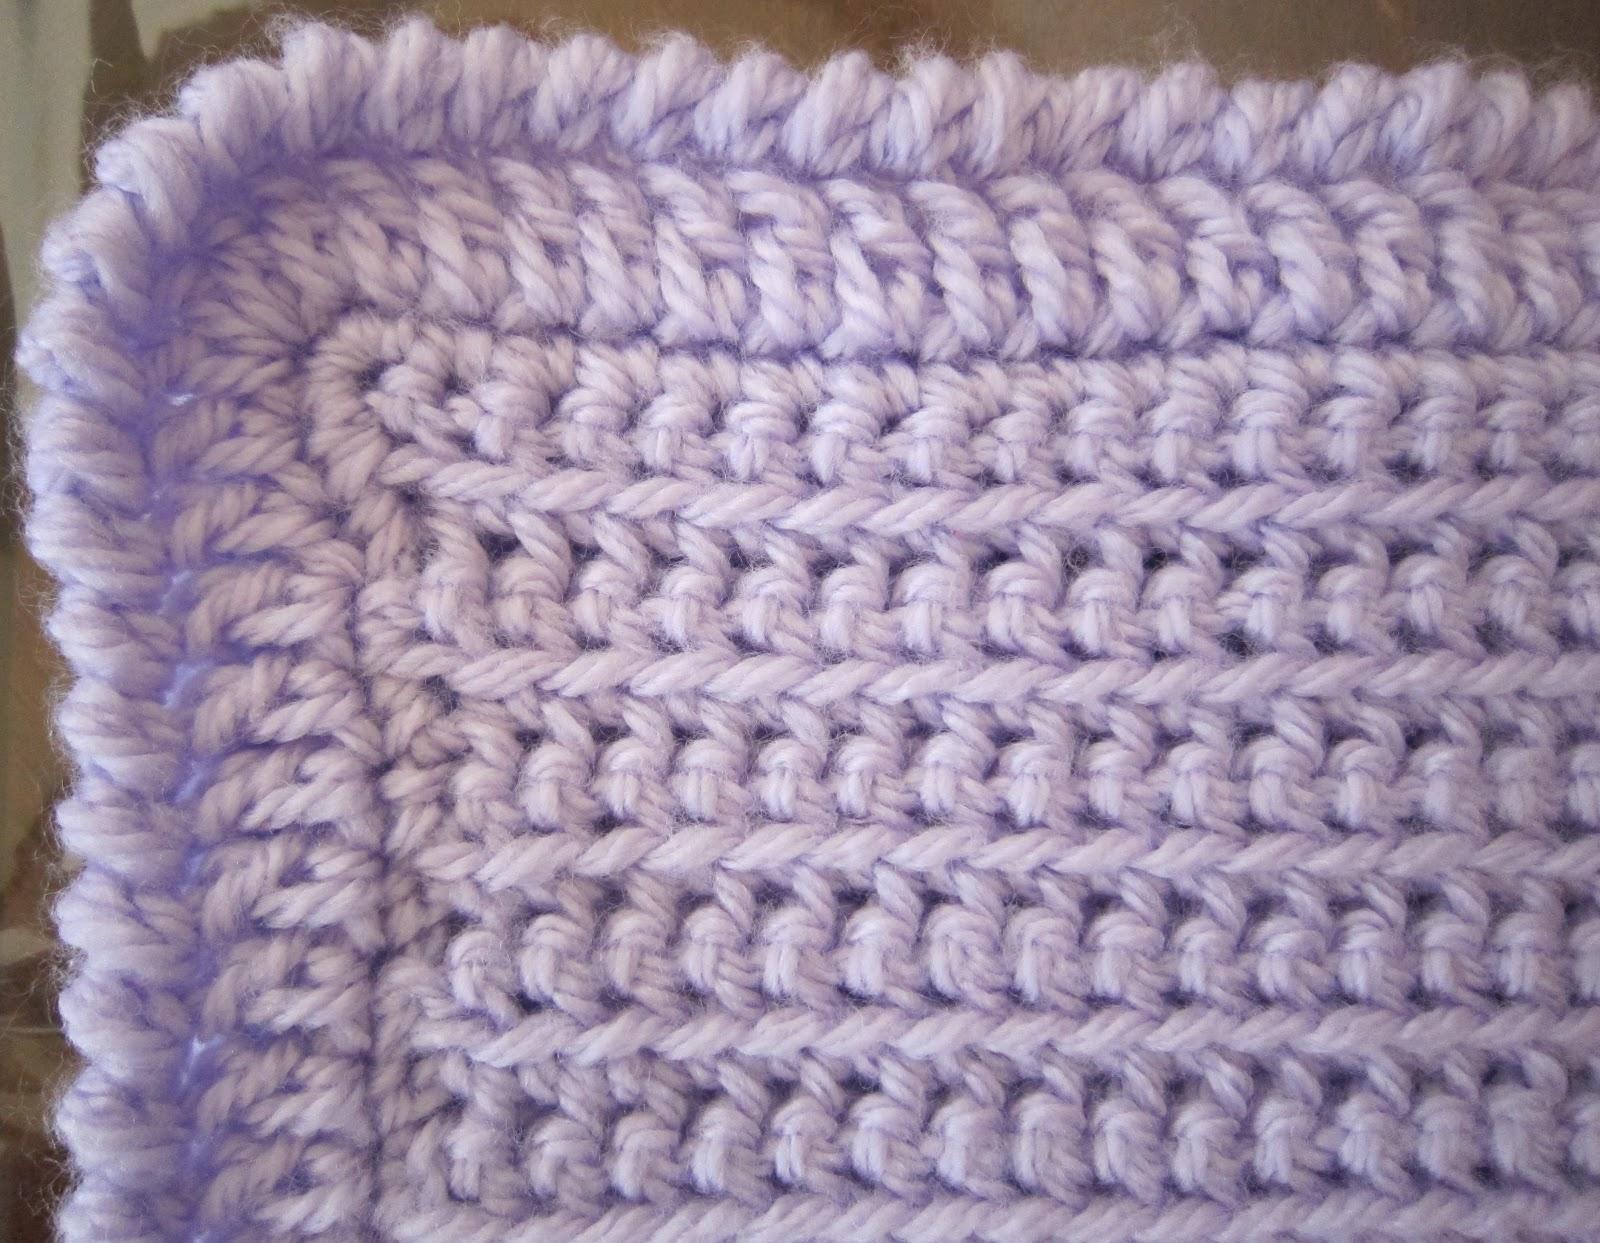 Reverse Single Crochet : Crab Stitch or Reverse Single Crochet: